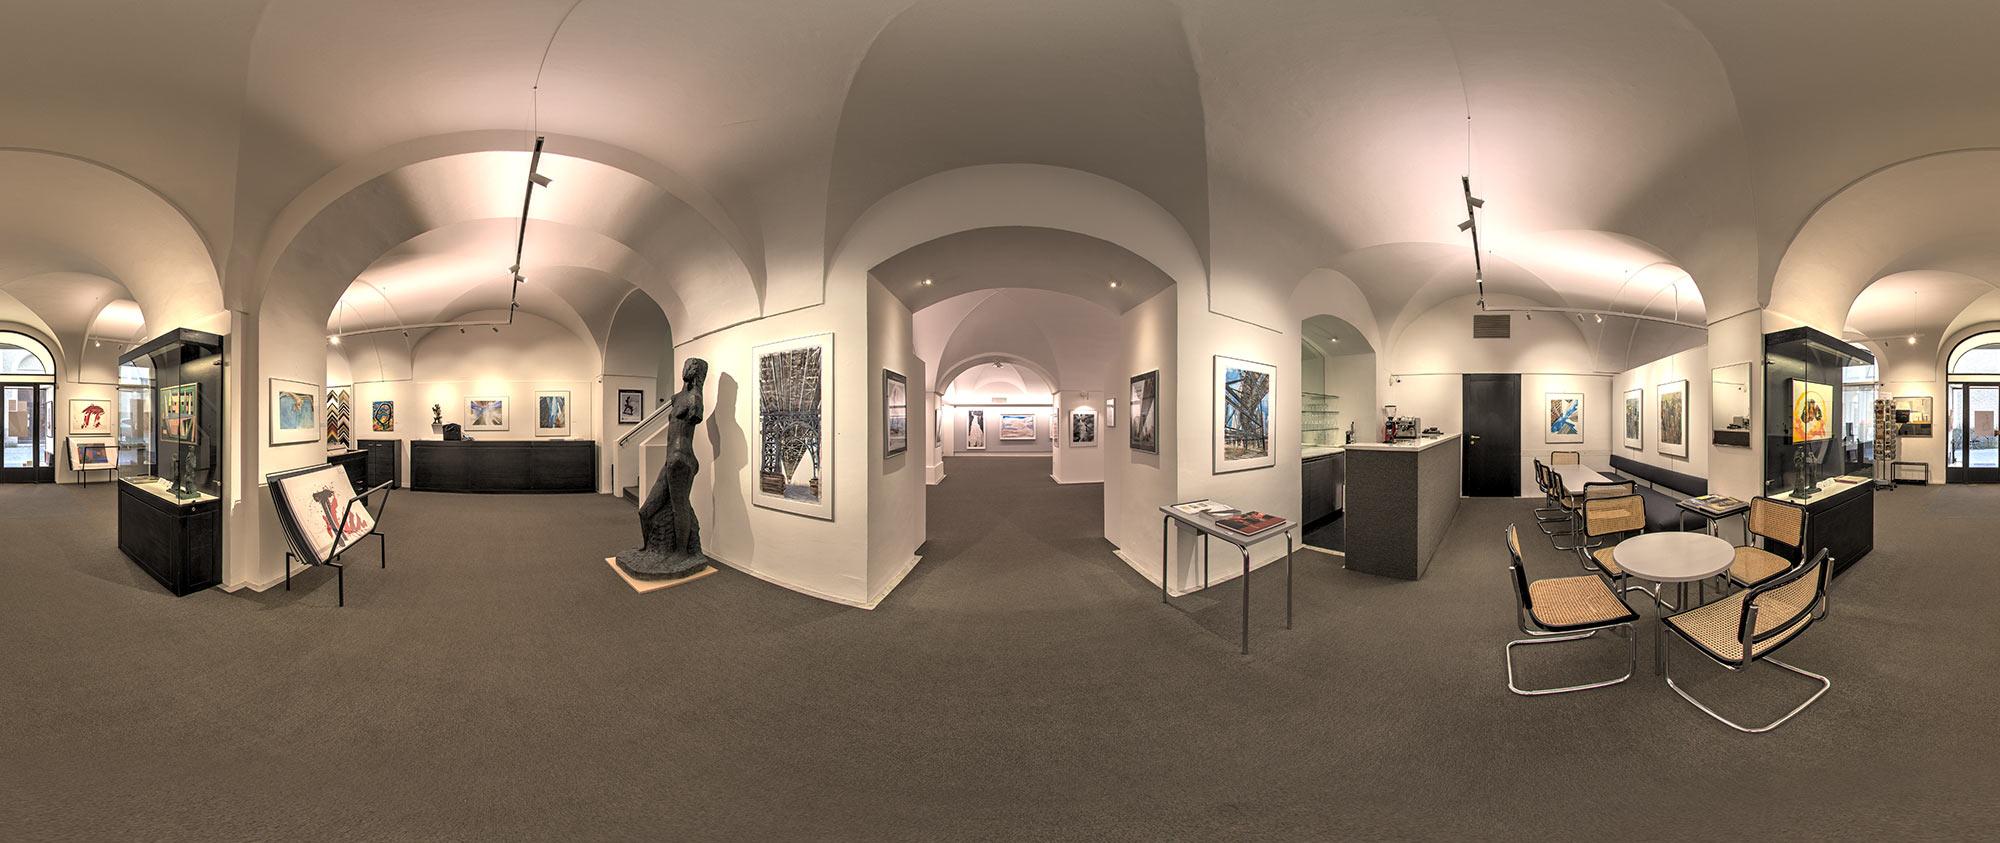 360° Panoramen virtuelle tour galerie_welz